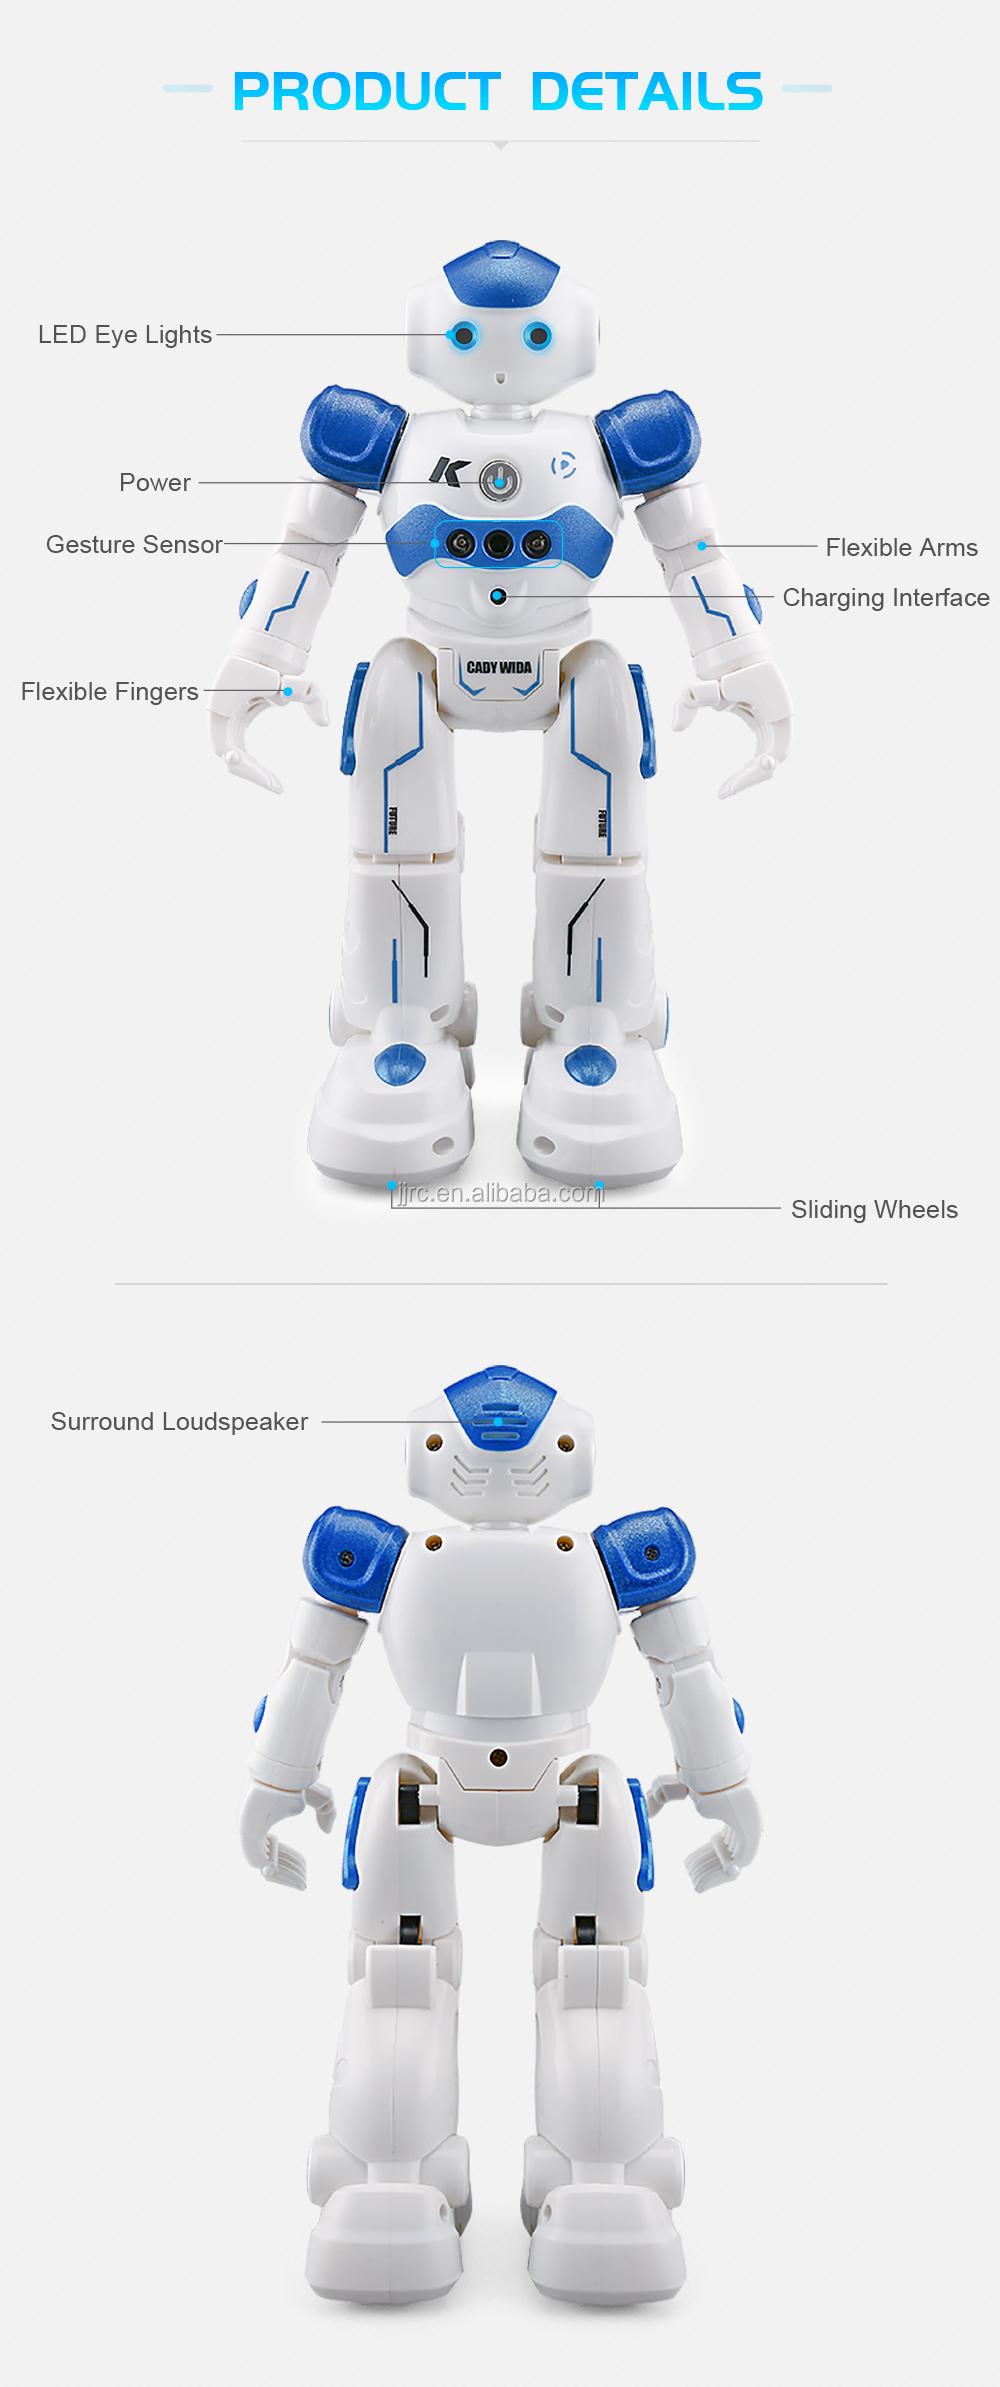 Jjrc R2 Smart Radio Control Intelligent Robot Dancing Sing Gesture